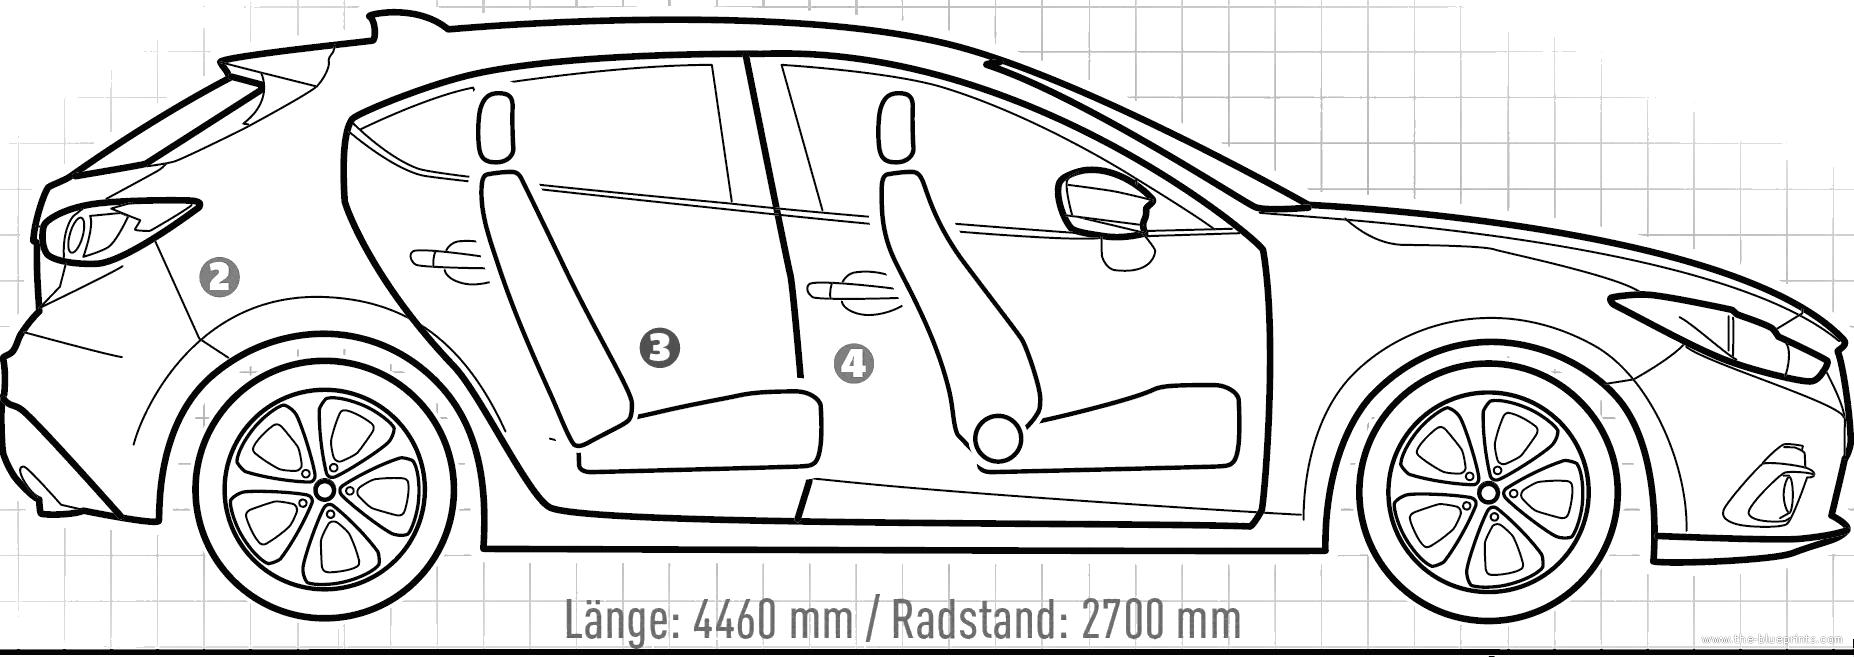 Blueprints > Cars > Mazda > Mazda 3 Mk.III (2013)